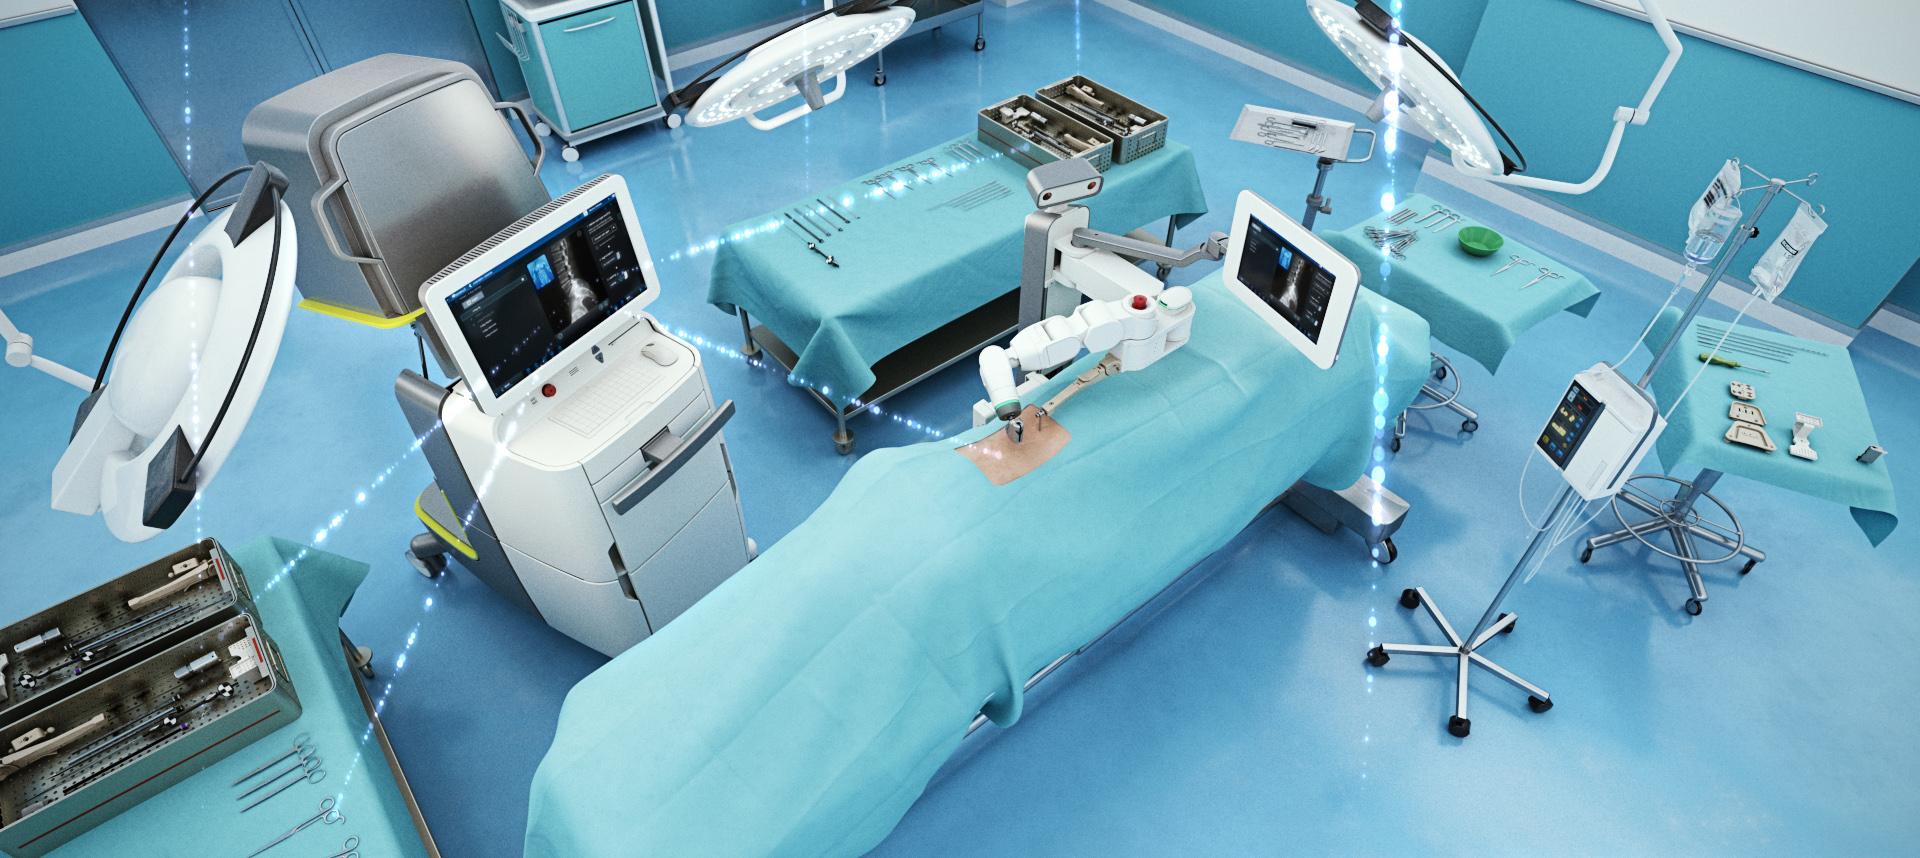 mazor-core-surgical-room